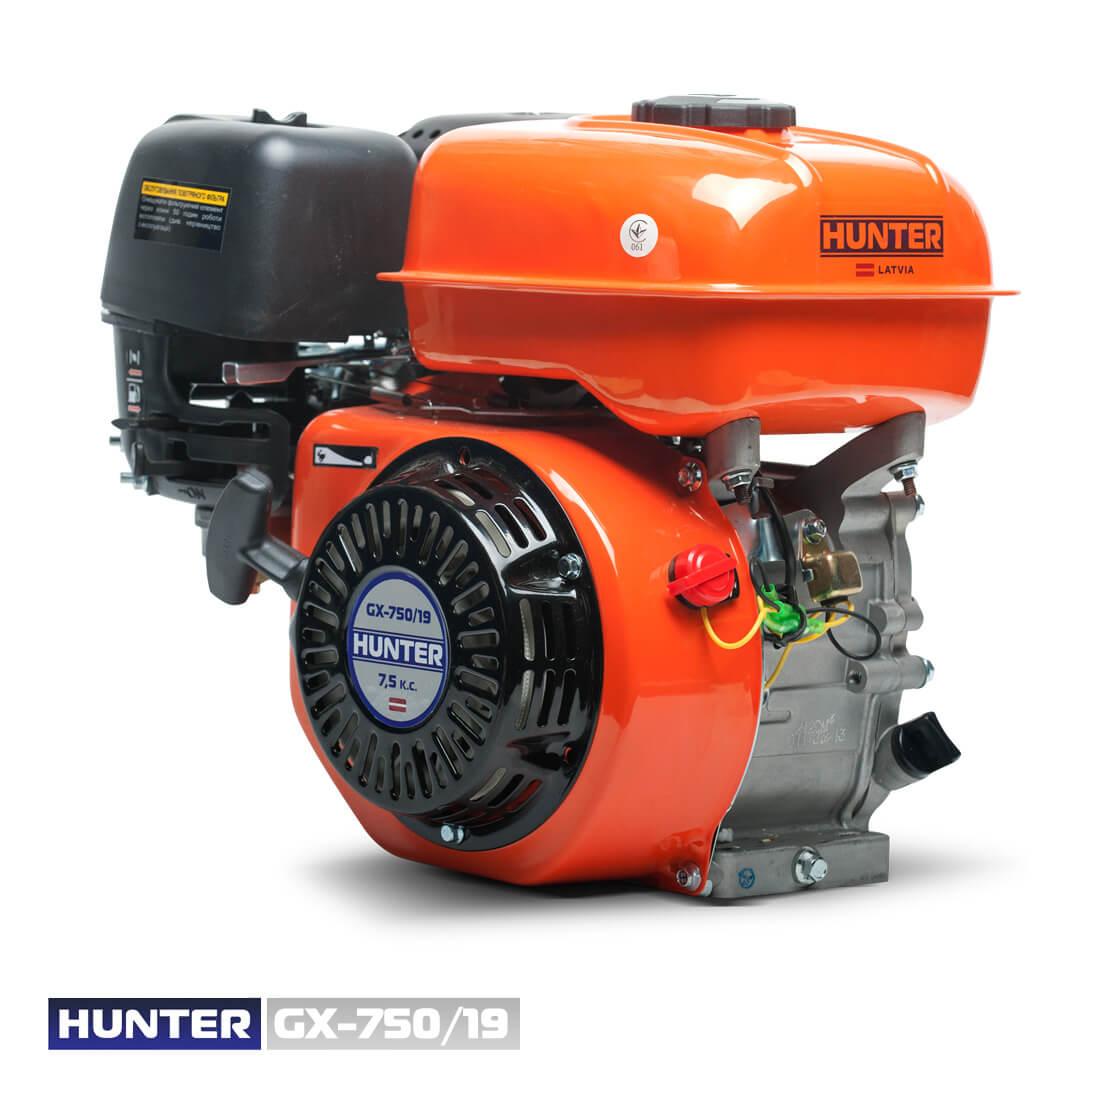 Фото GX-750/19 цена 4250грн №1 — Hunter